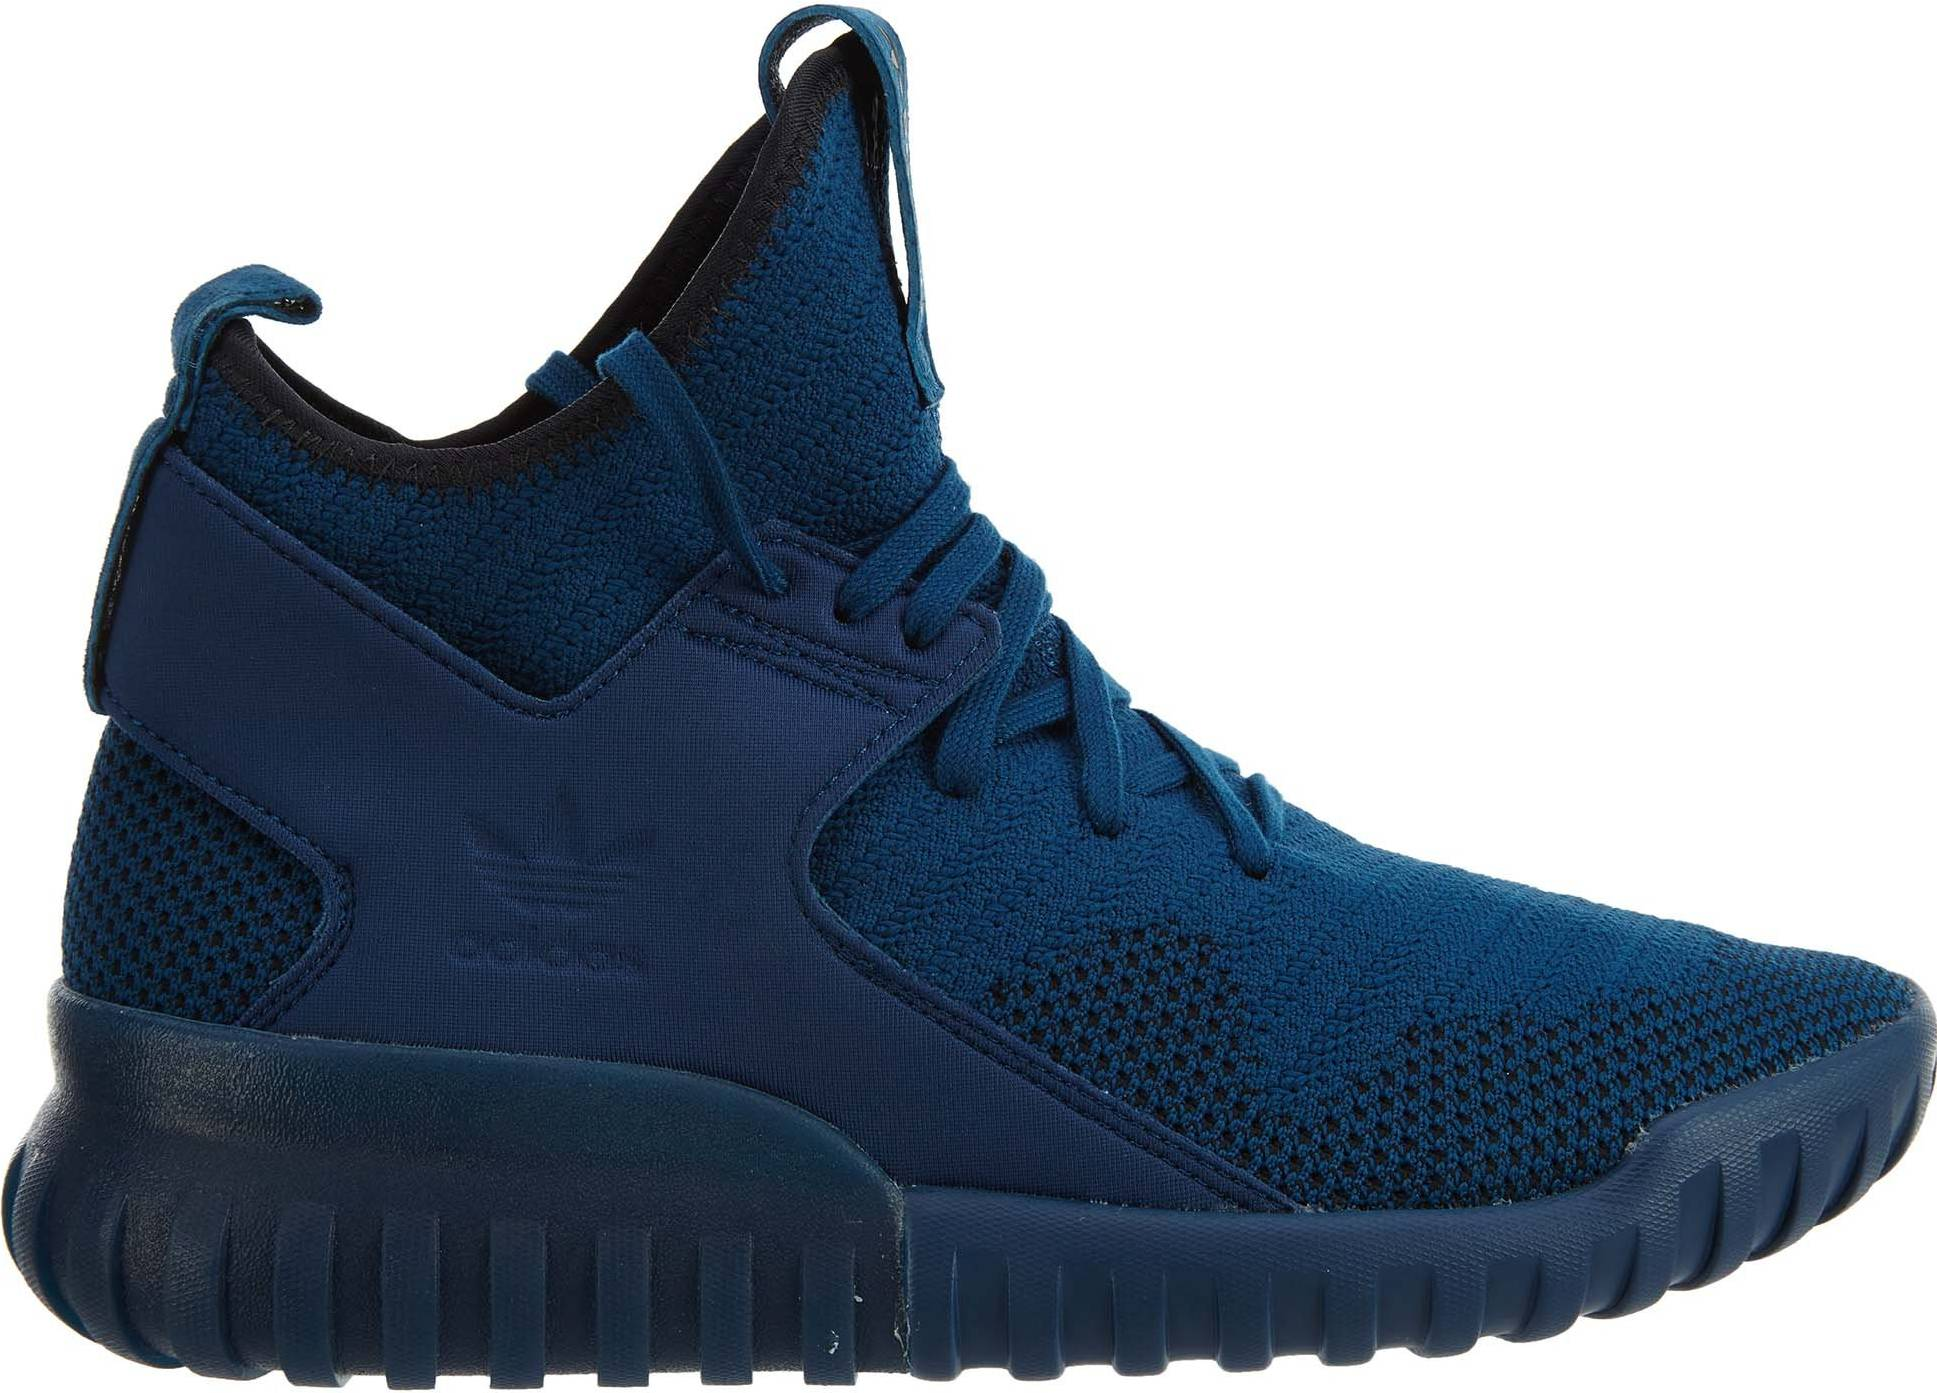 liberal privado bar  Adidas Tubular X Primeknit sneakers in 6 colors (only $85) | RunRepeat